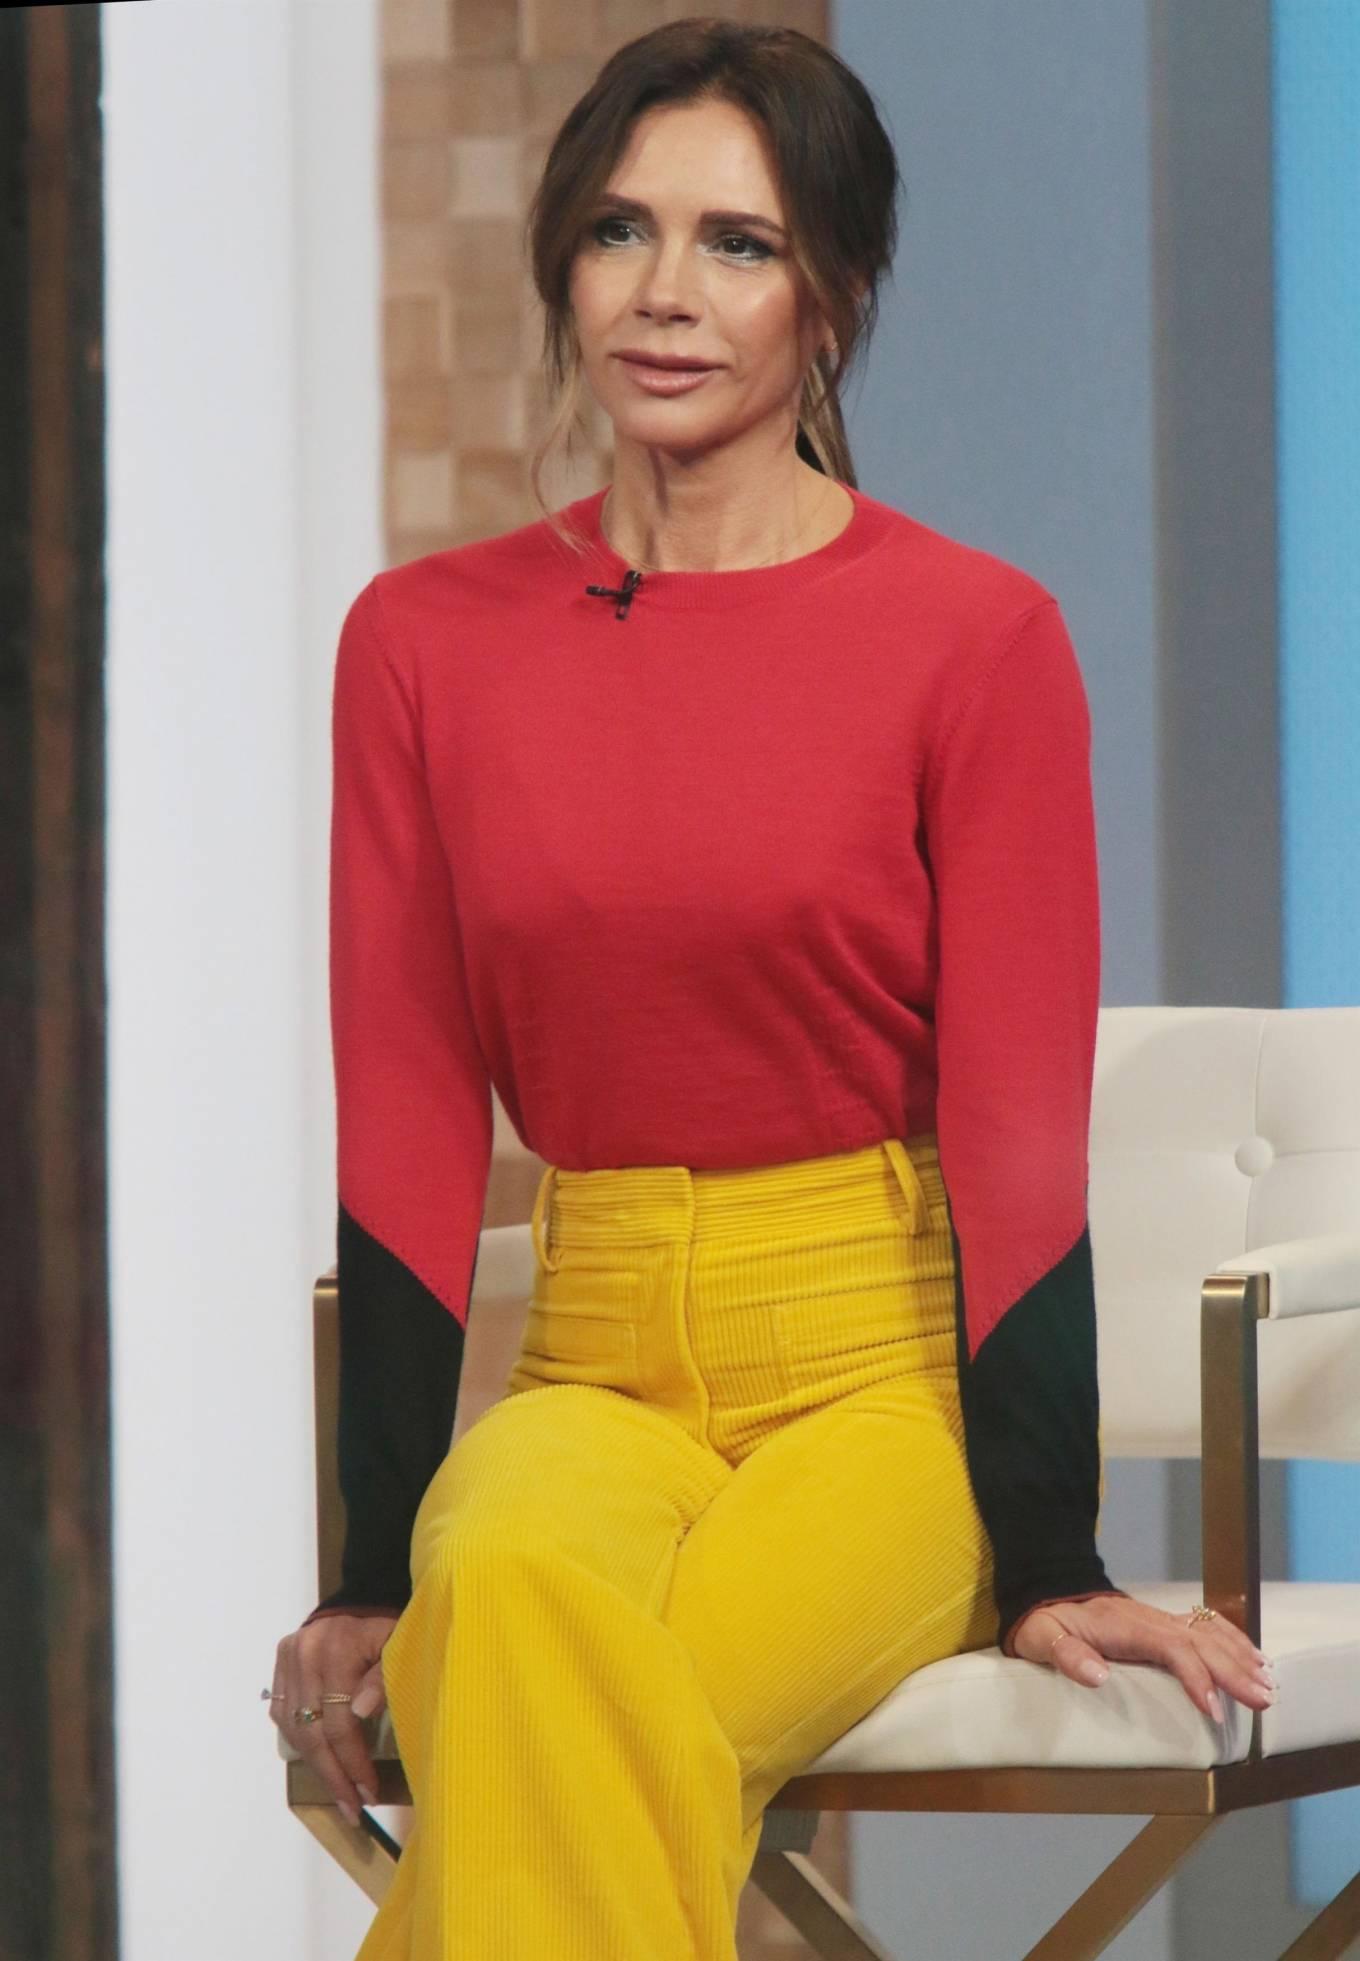 Victoria Beckham 2021 : Victoria Beckham – on Good Morning America promoting her new designer clothing in New York City-28